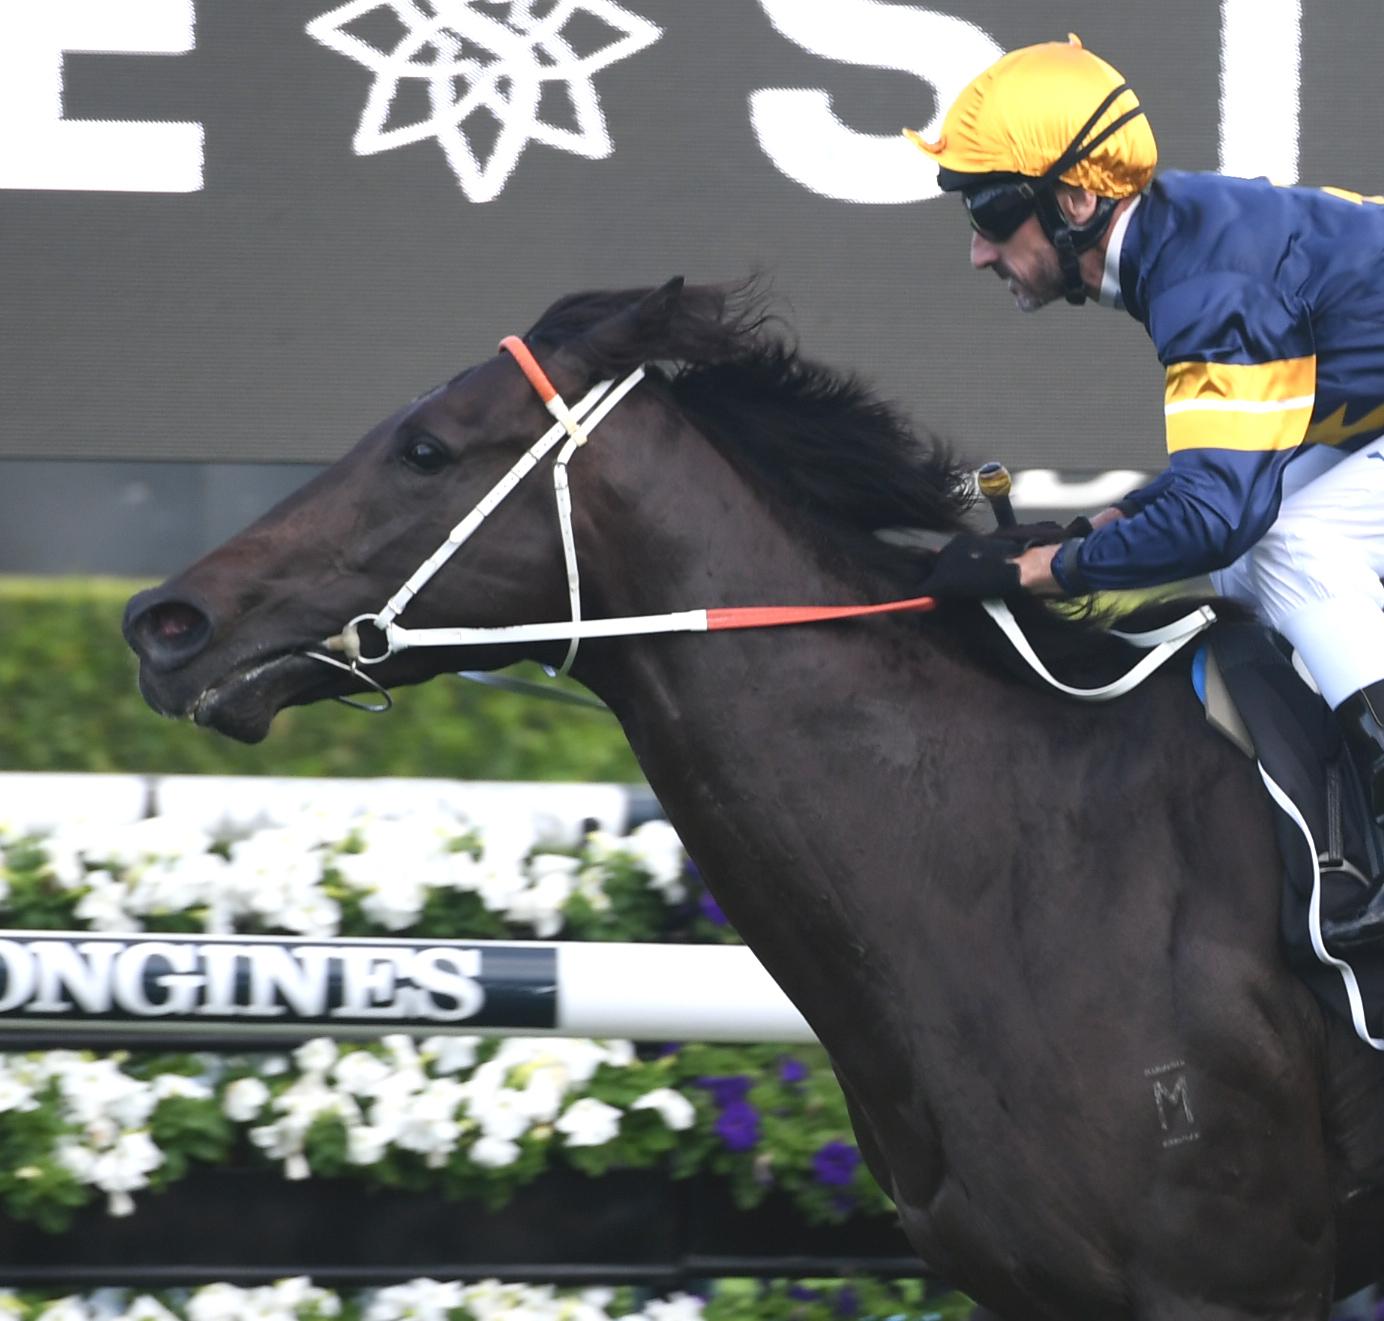 https://www.stallions.com.au/wp-content/uploads/2020/04/Brutal-060419-9910-1.jpg